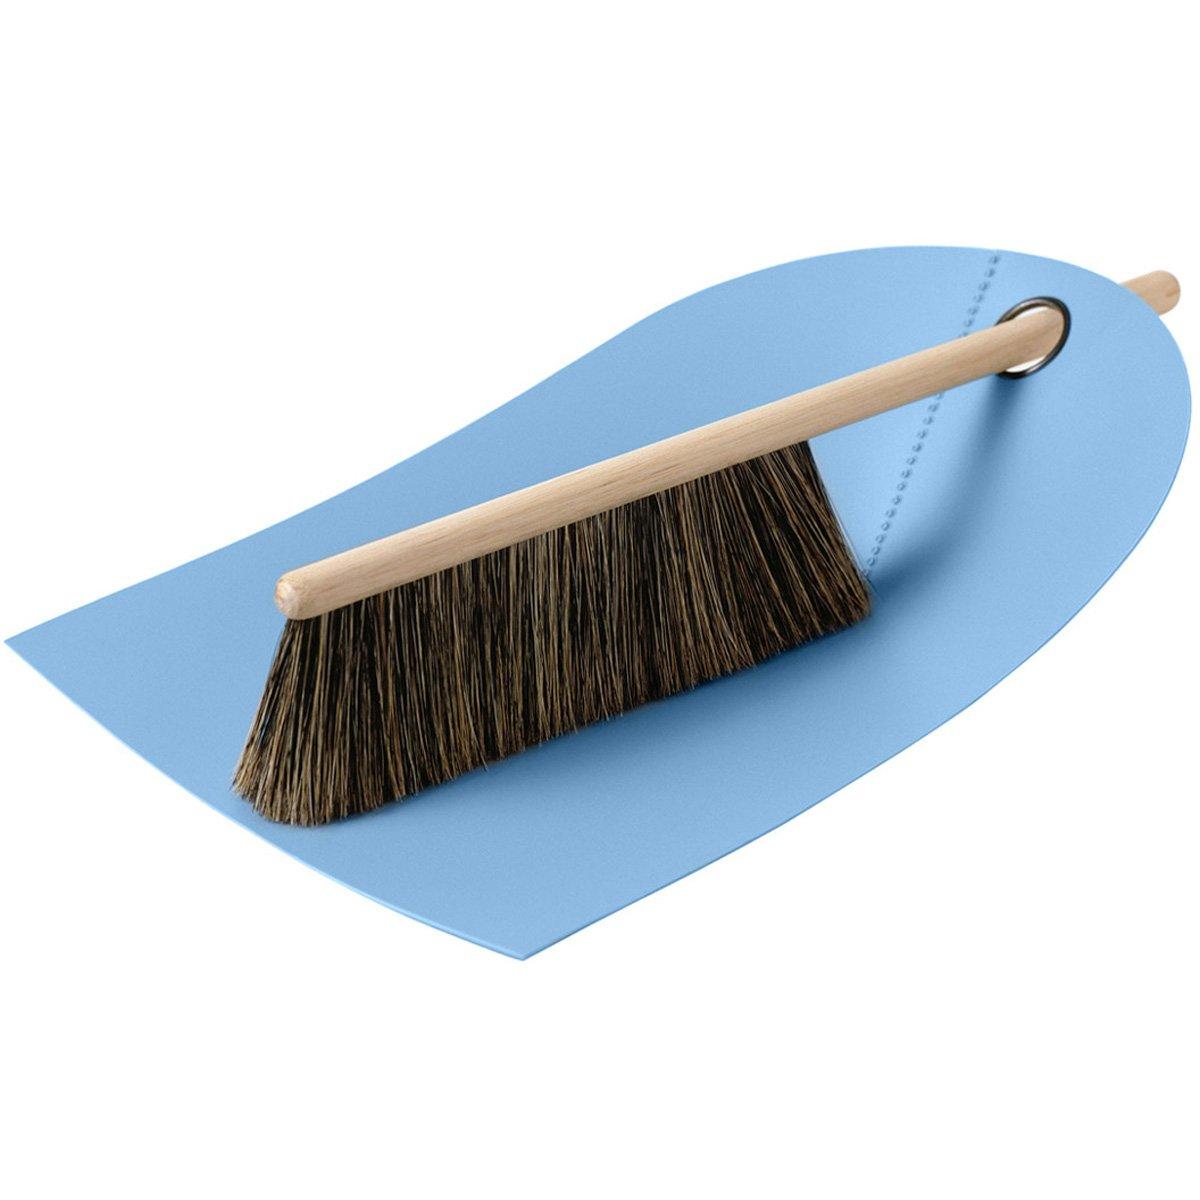 Dustpan & Broom - Blue